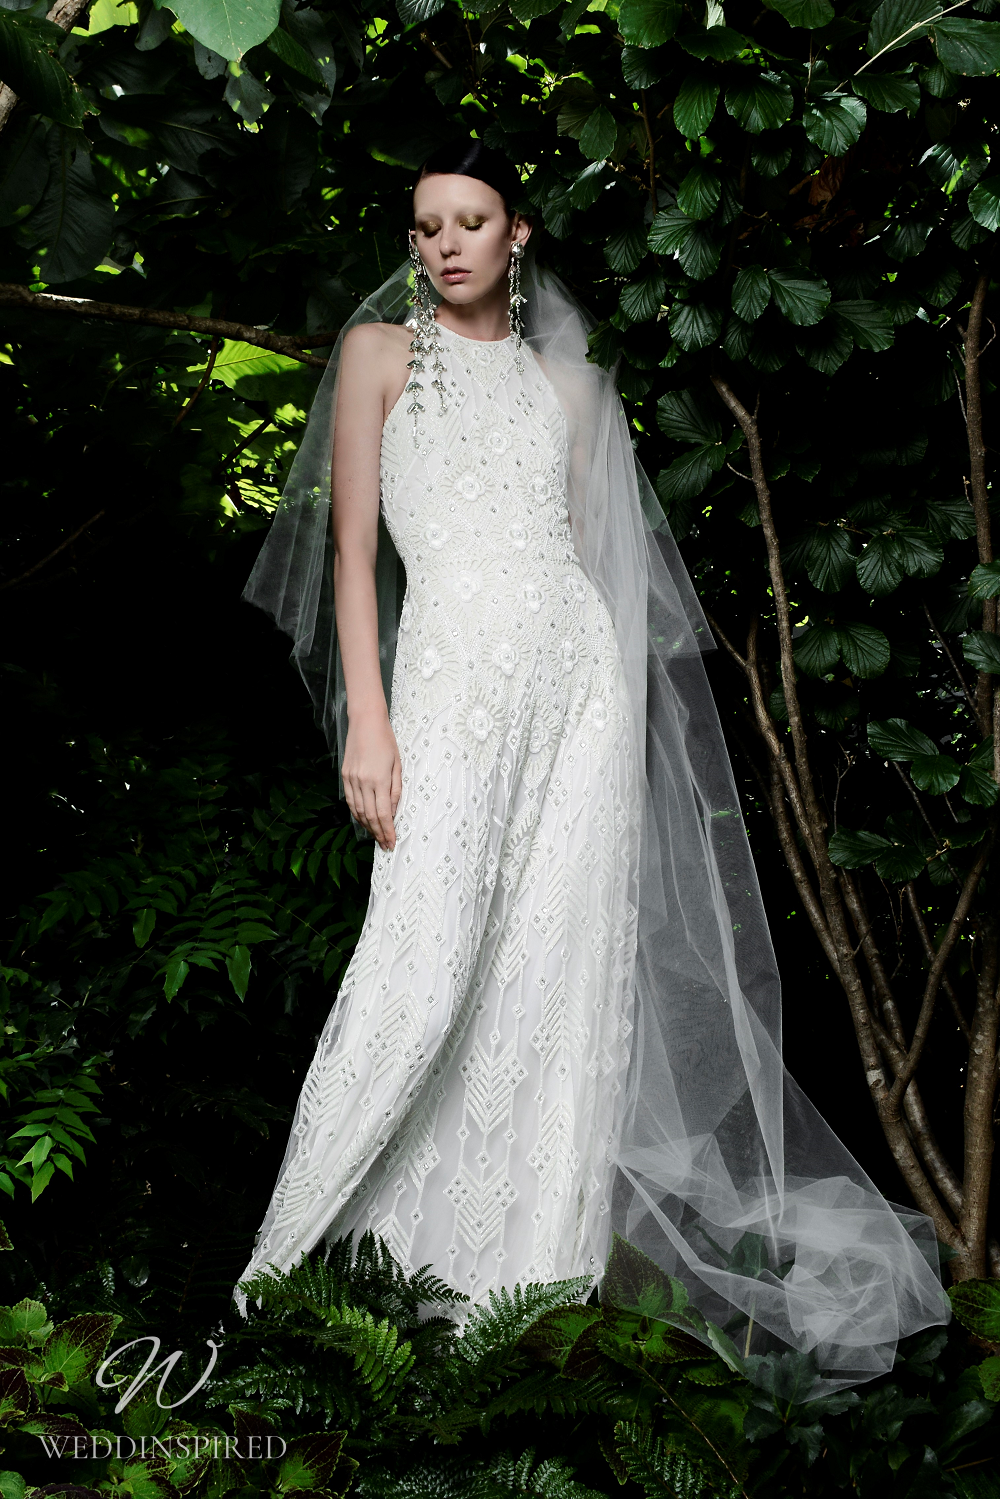 A Naeem Khan Fall 2021 lace A-line wedding dress with a high neckline and a geometric pattern